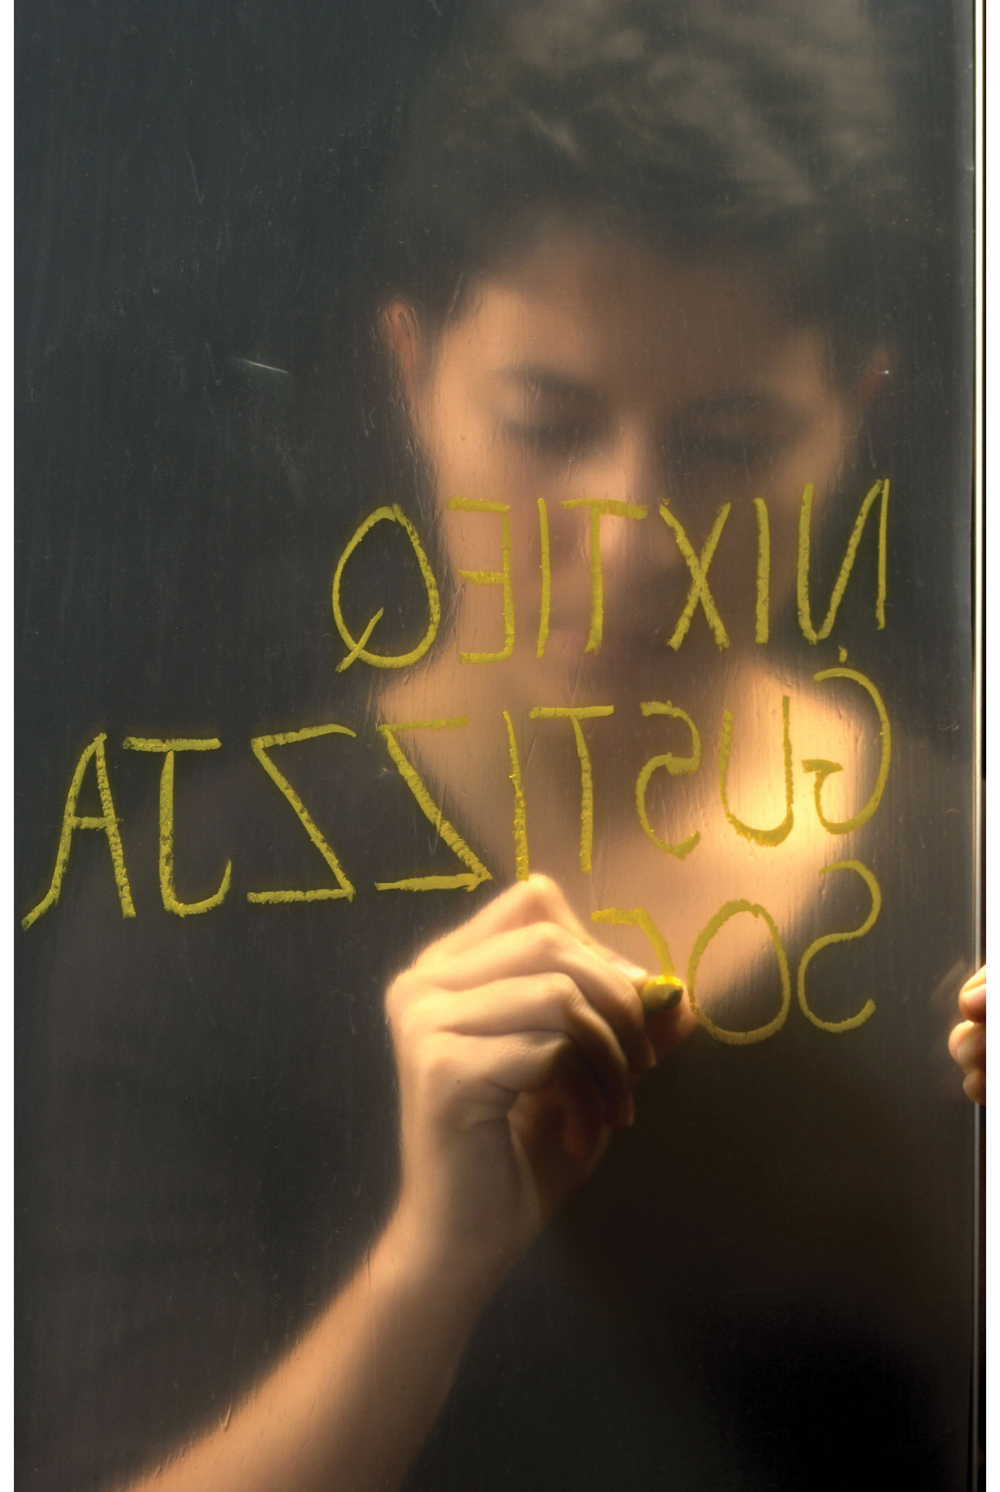 Nixtieq-Isabelle-writing.jpg